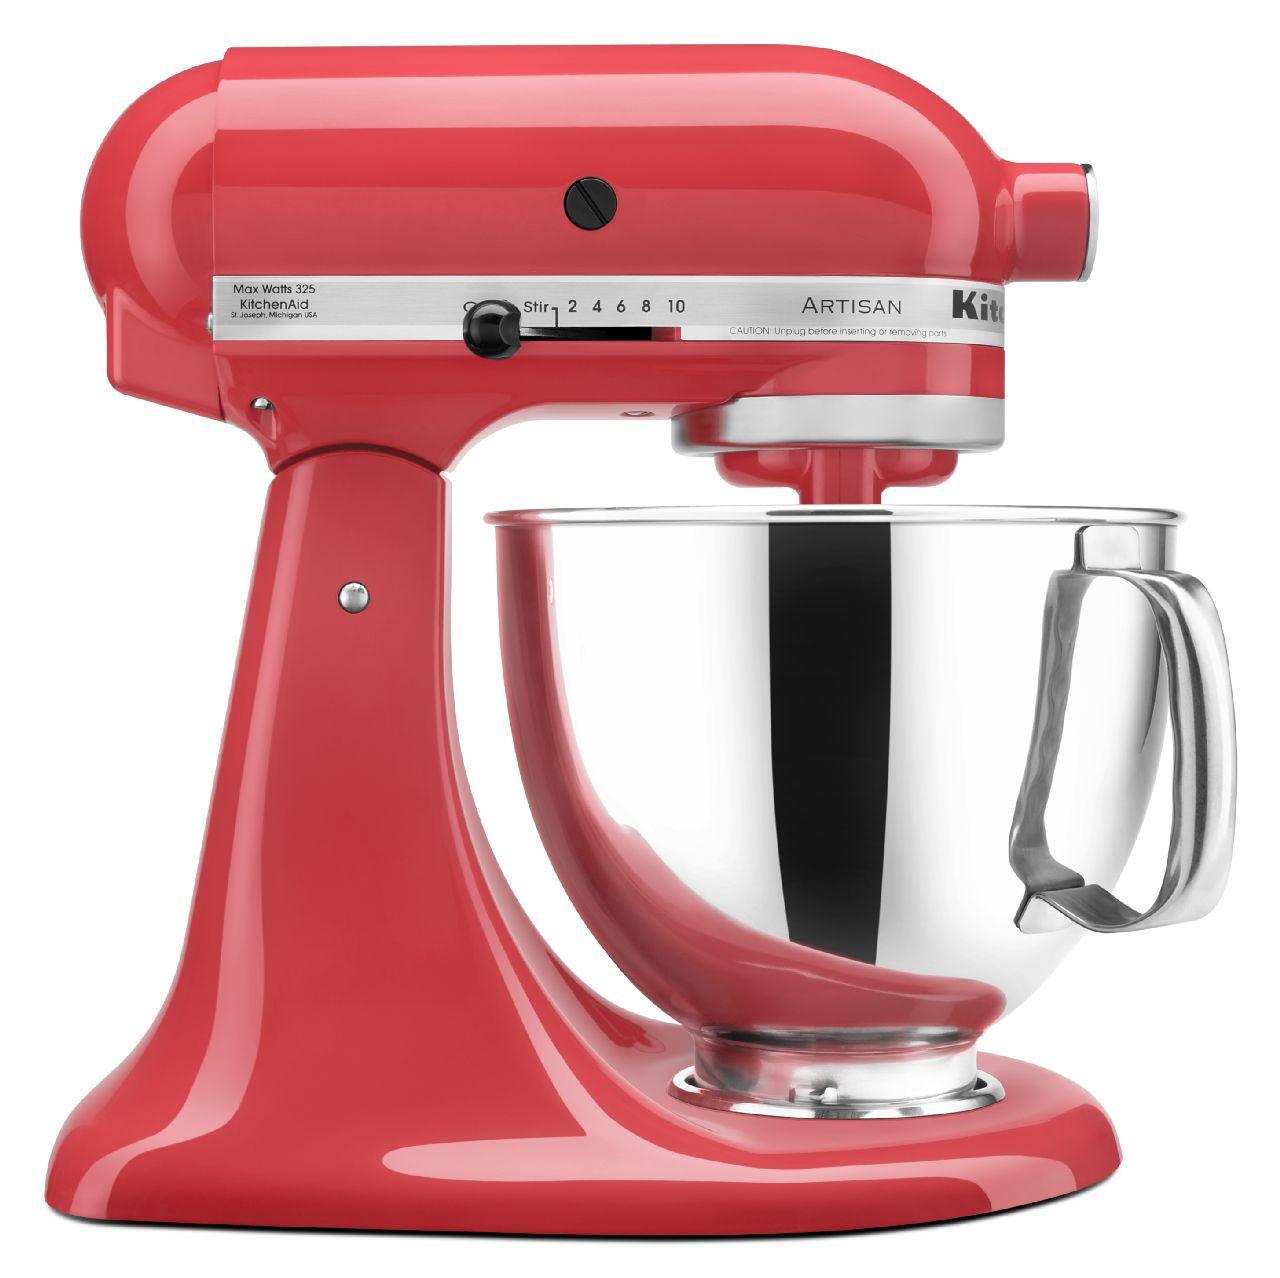 Kitchenaid Artisan Series Stand Mixer Ksm150pswm